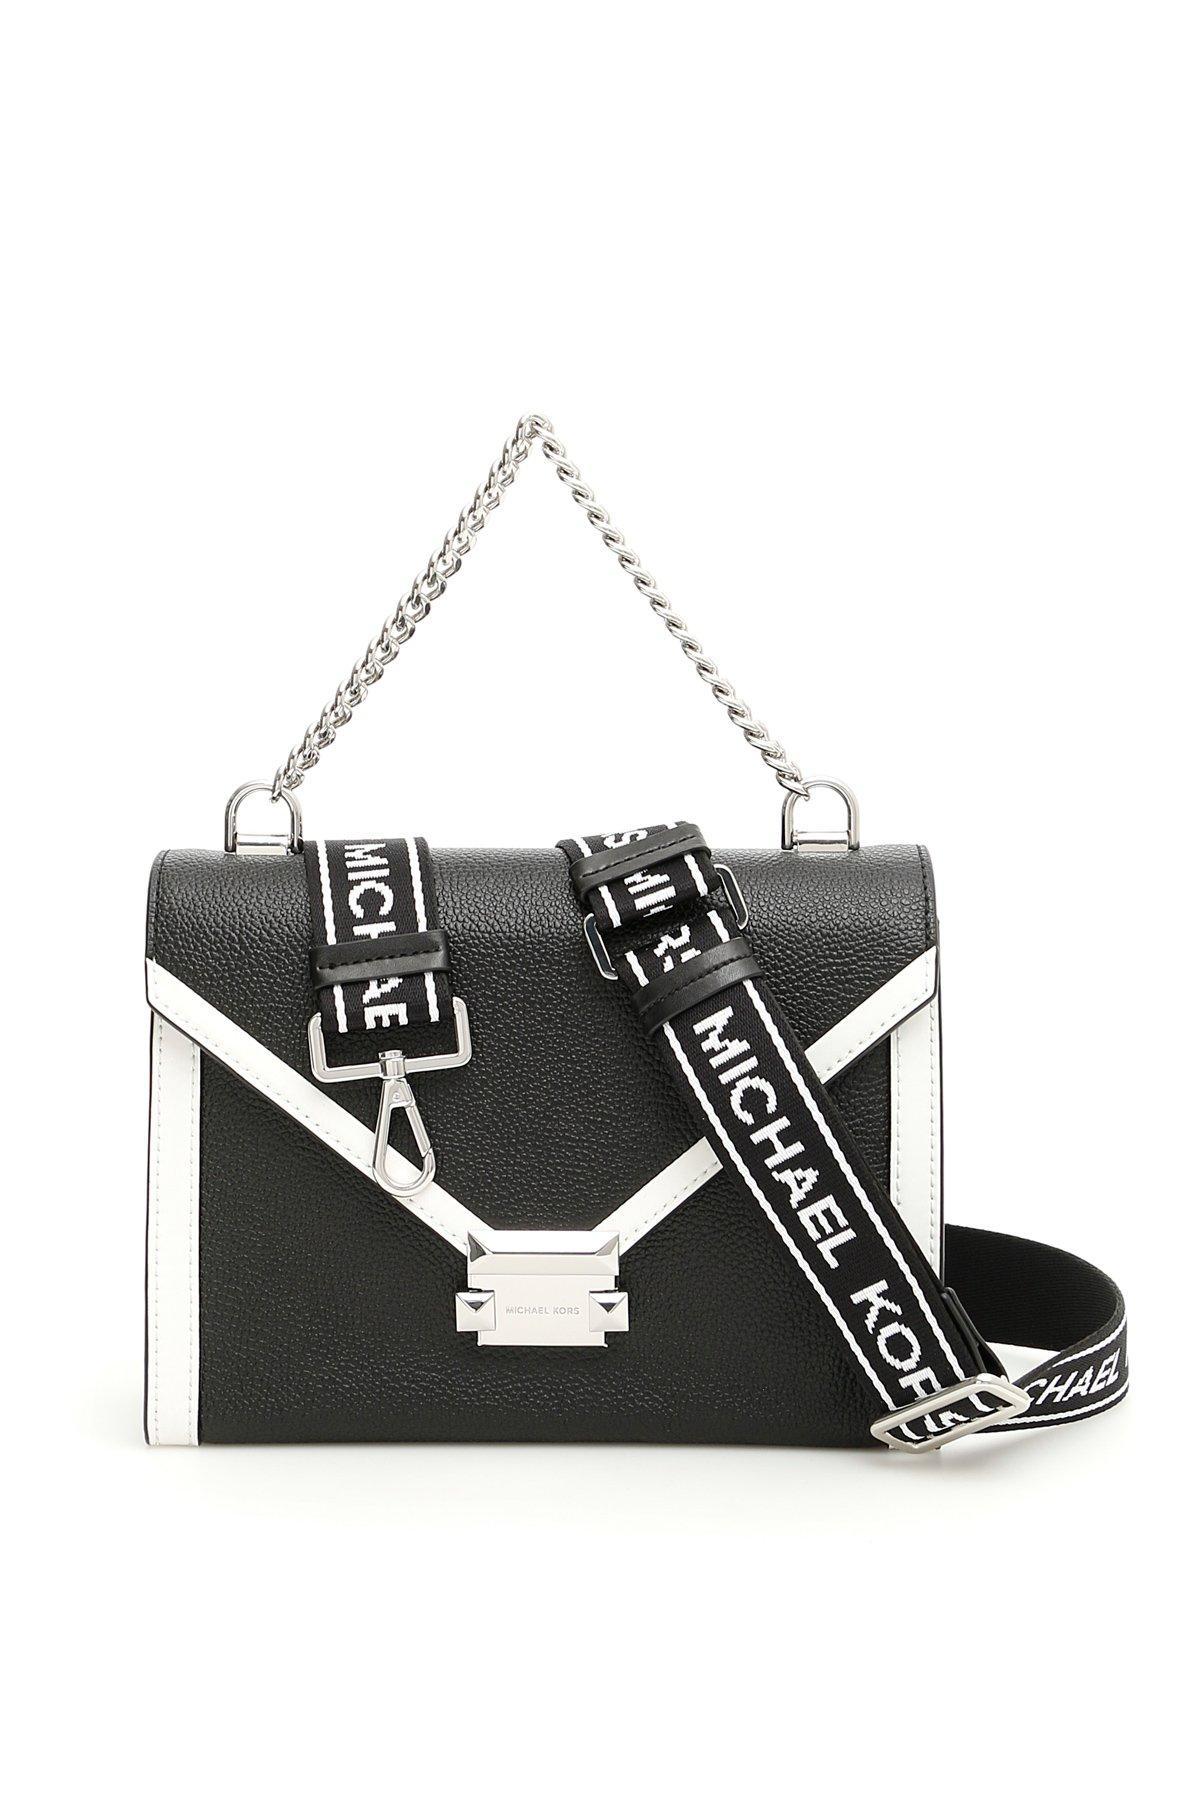 b31dc1125 MICHAEL Michael Kors All Logo Strap Crossbody Bag in Black - Lyst